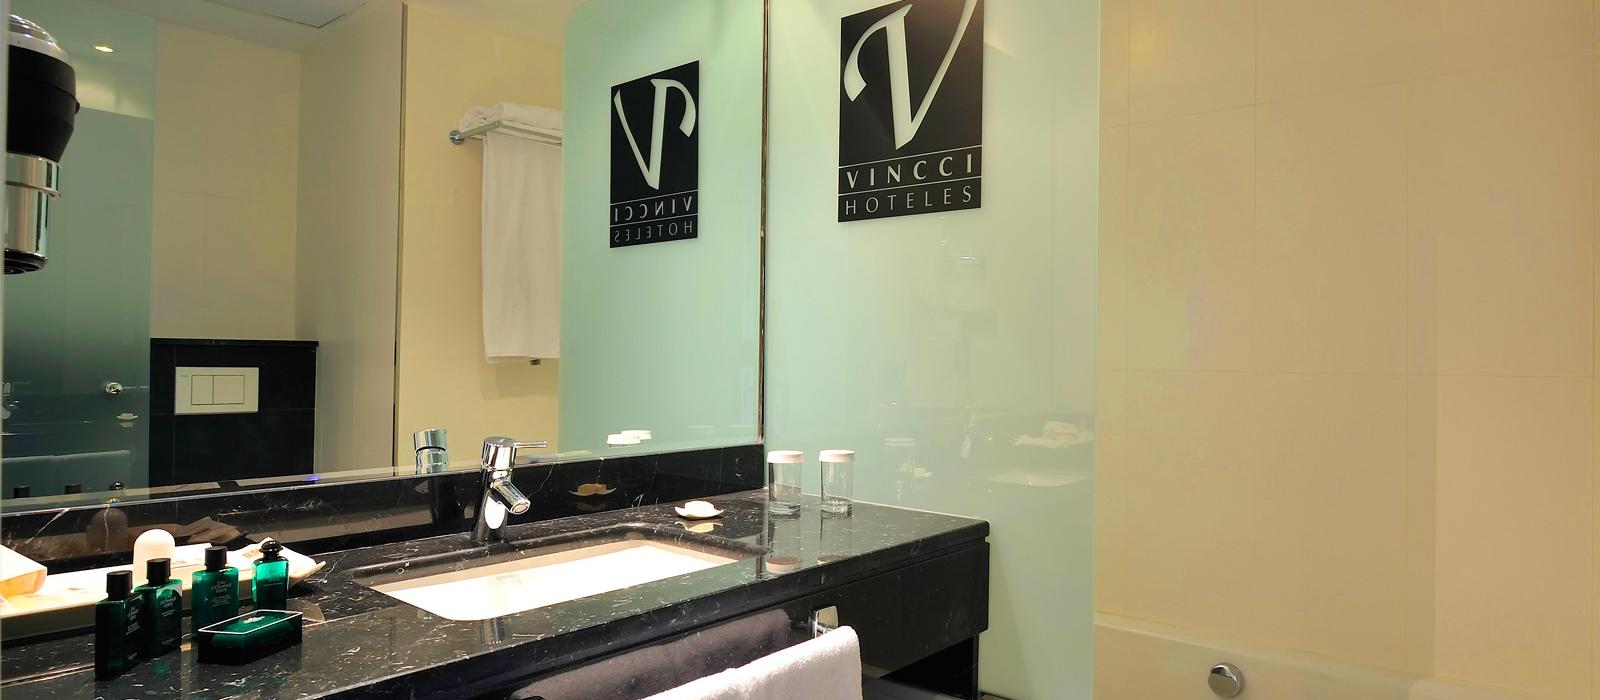 Junior Suite - Chambres Hôtel Malaga - Vincci Hoteles